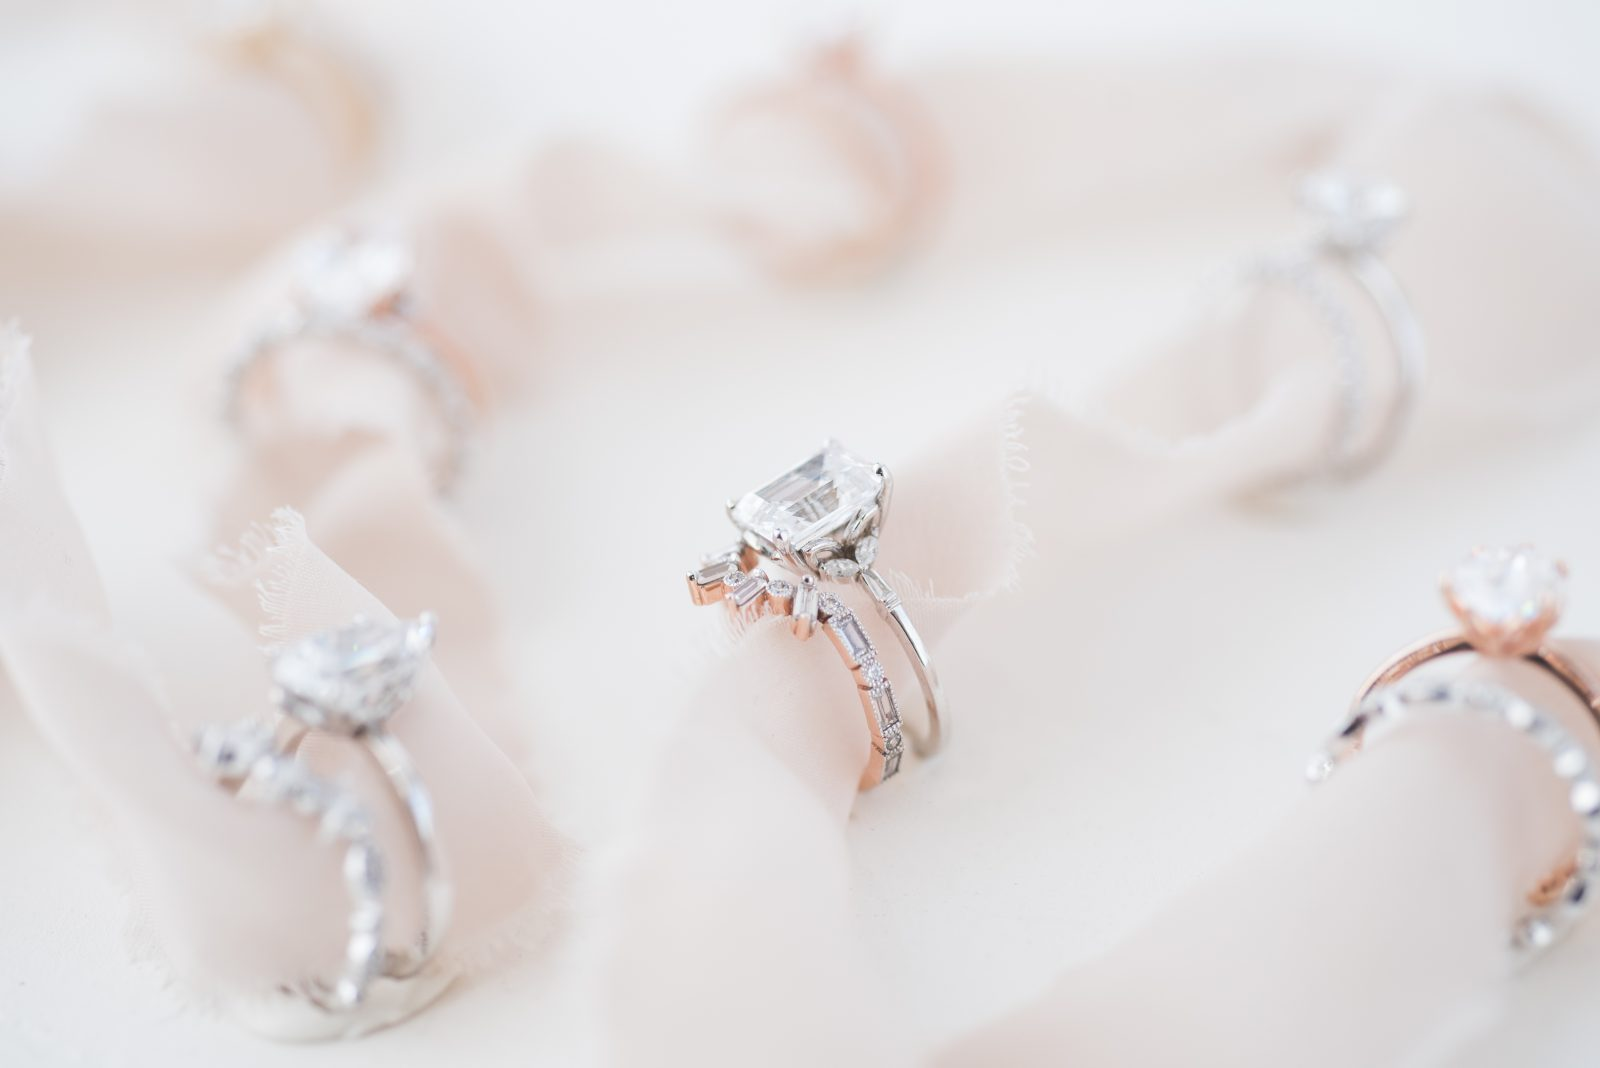 stor by margot engagement rings and wedding bands - ottawa fine jeweler - diamonds, gold - luxury wedding - photography by emma